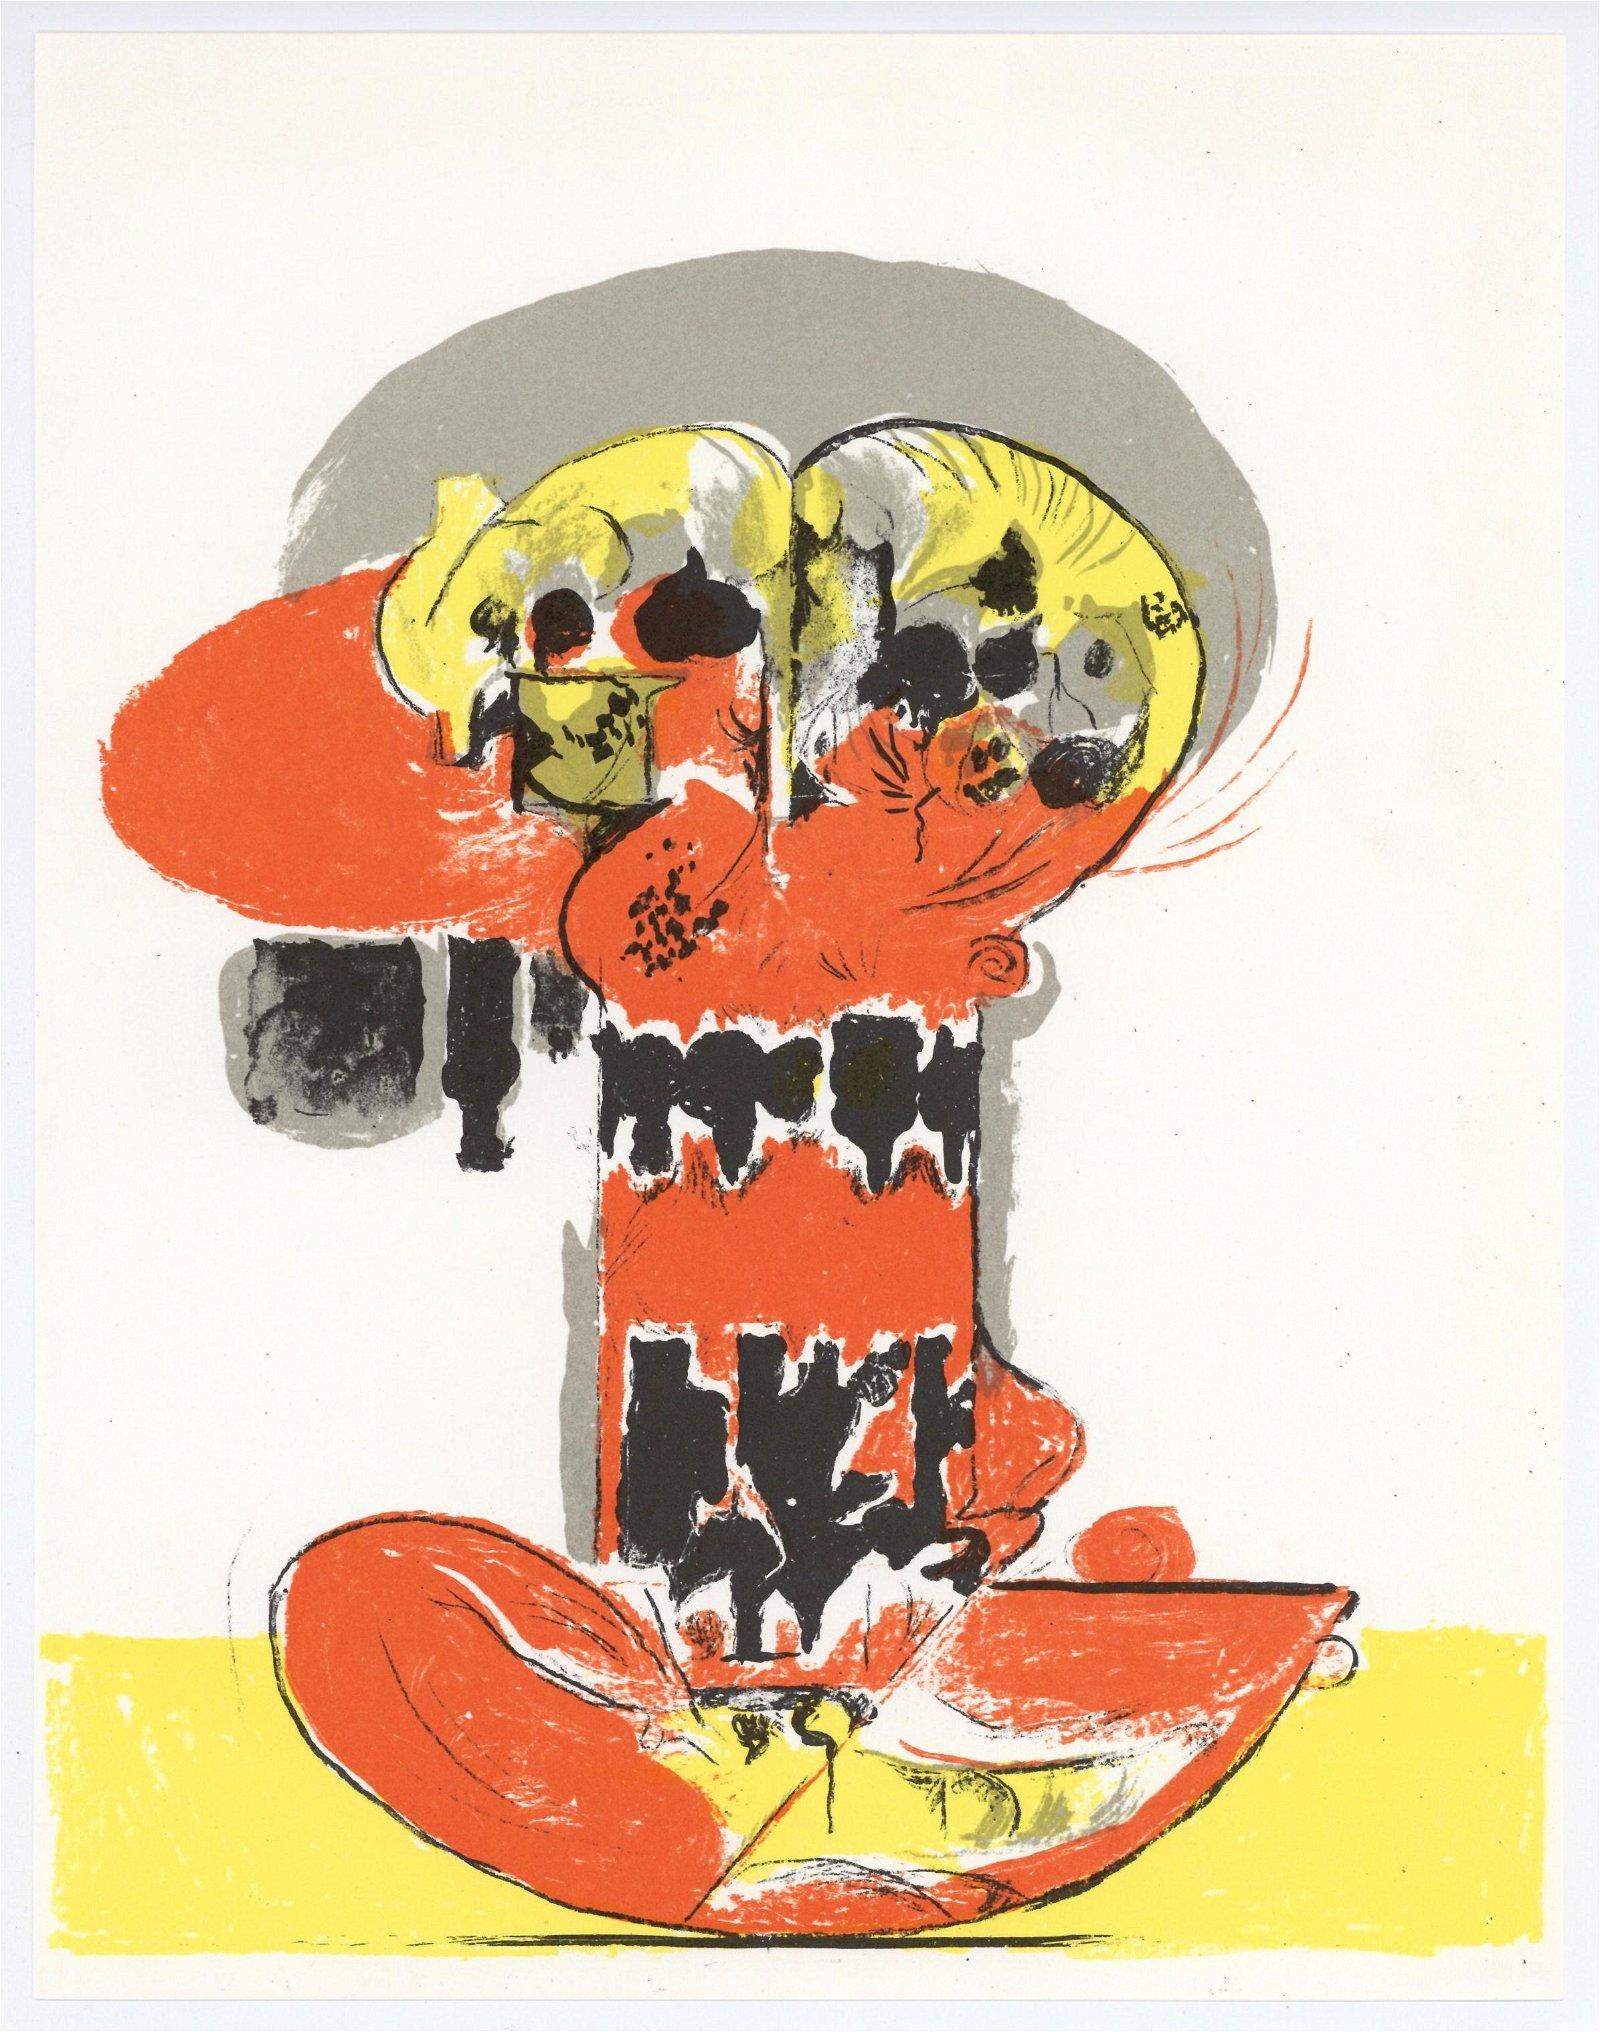 Graham Sutherland original lithograph